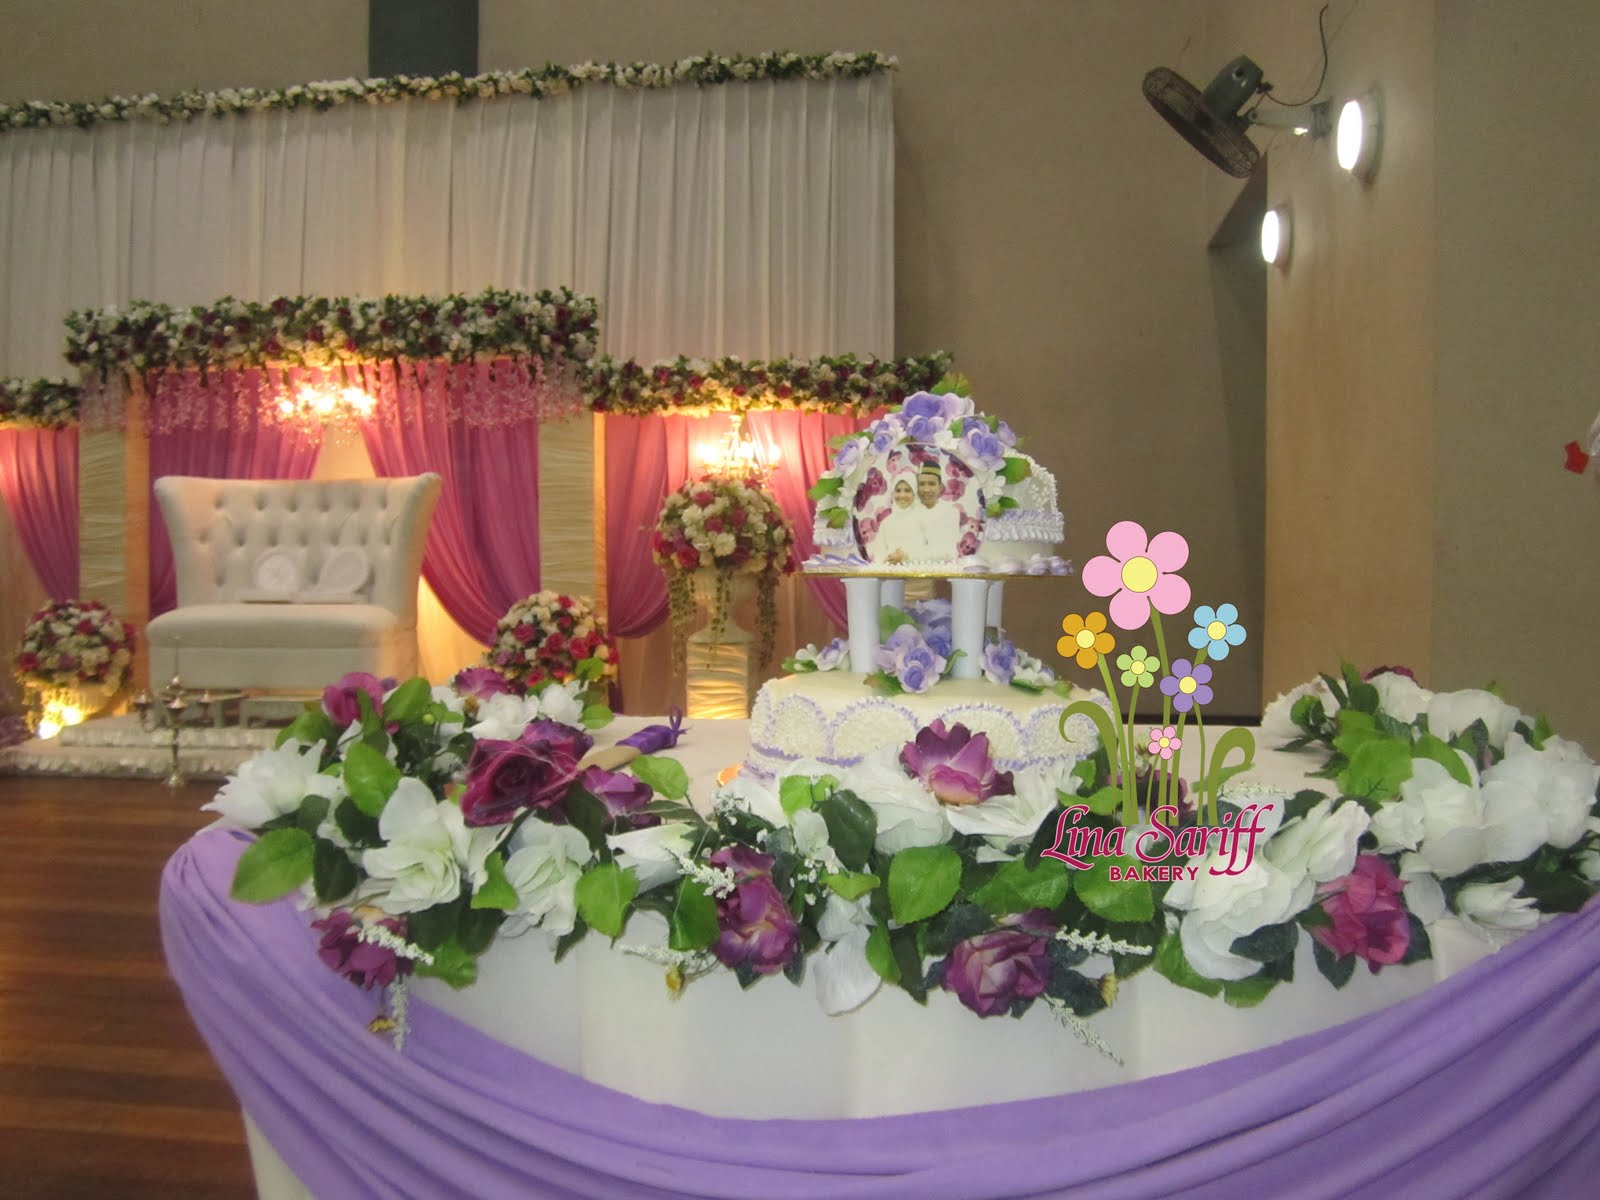 Lina Sariff Bakery 2 tier steam buttercream wedding cake